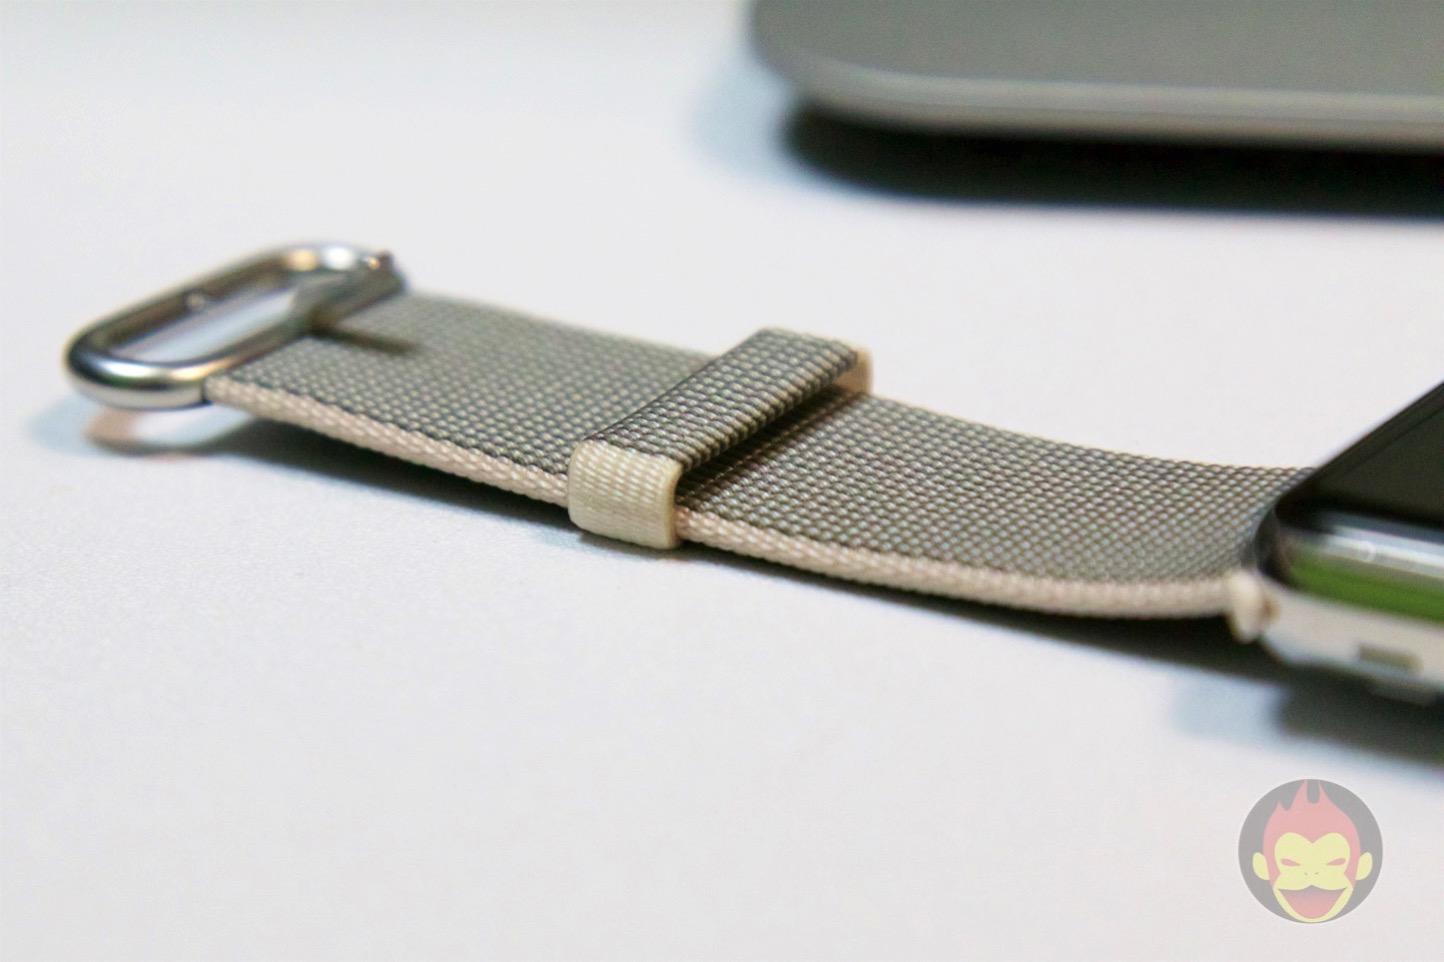 Apple-Watch-Woven-Nylon-Band-10.jpg